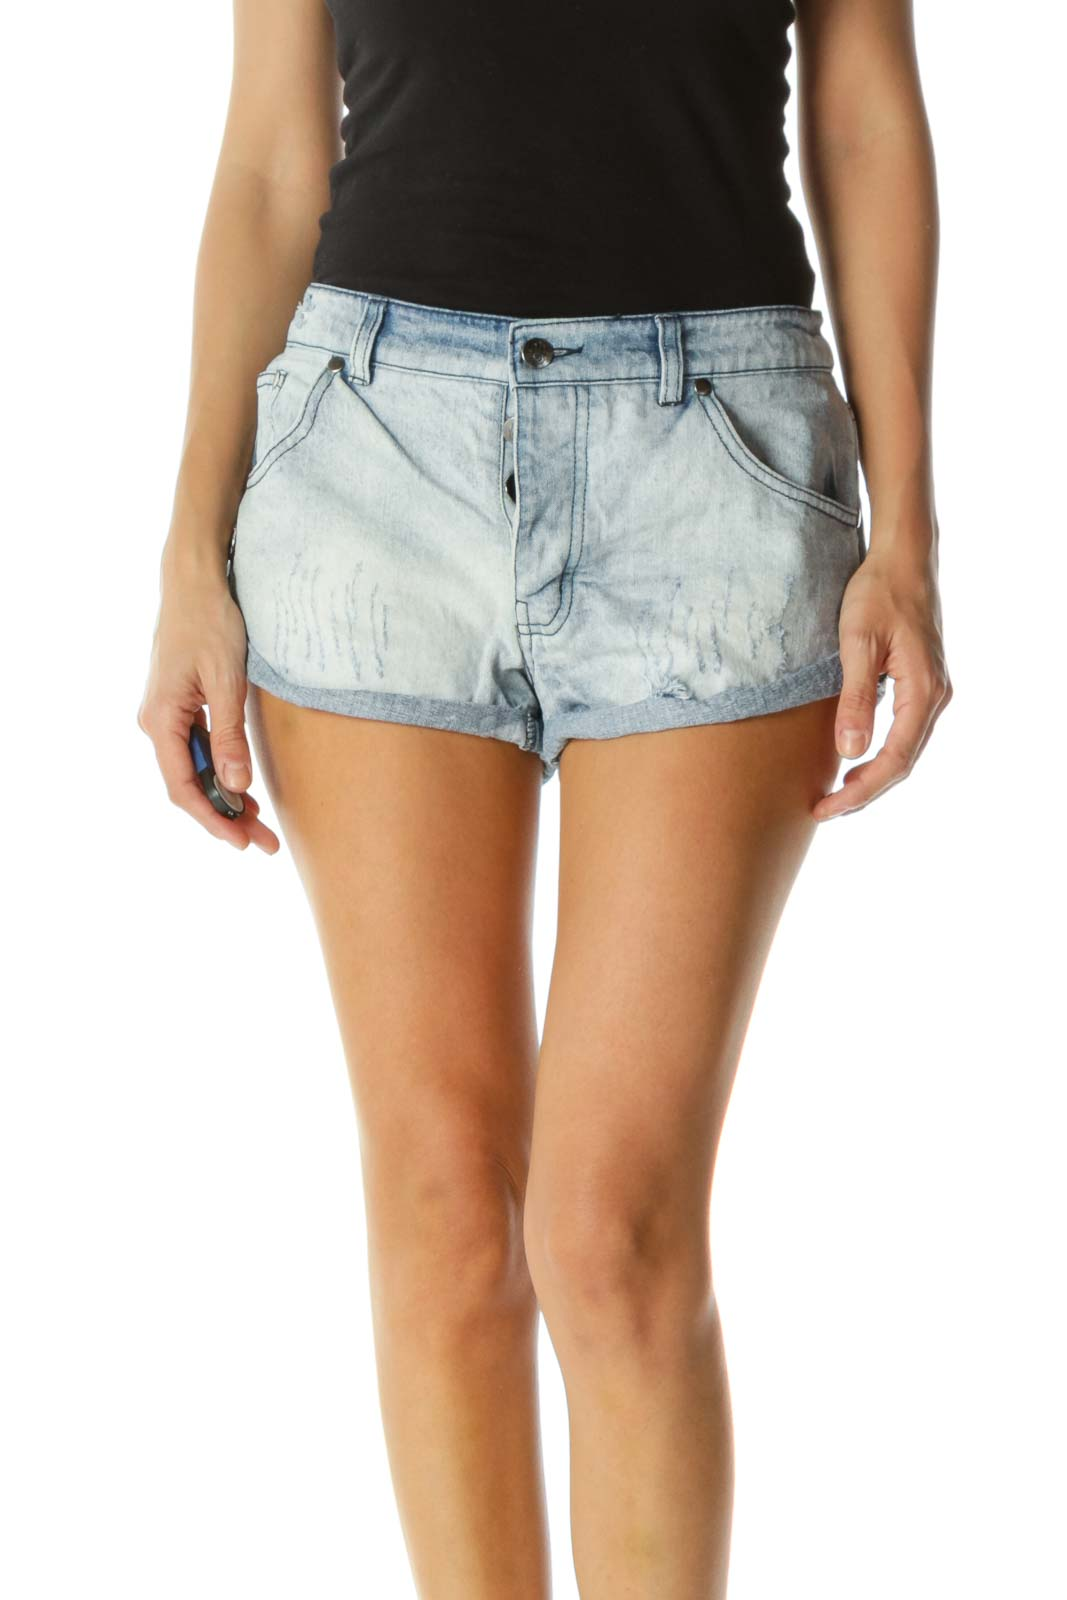 Blue Light-Wash 100% Cotton Distressed Peace Applique Buttoned-Fly Denim Shorts